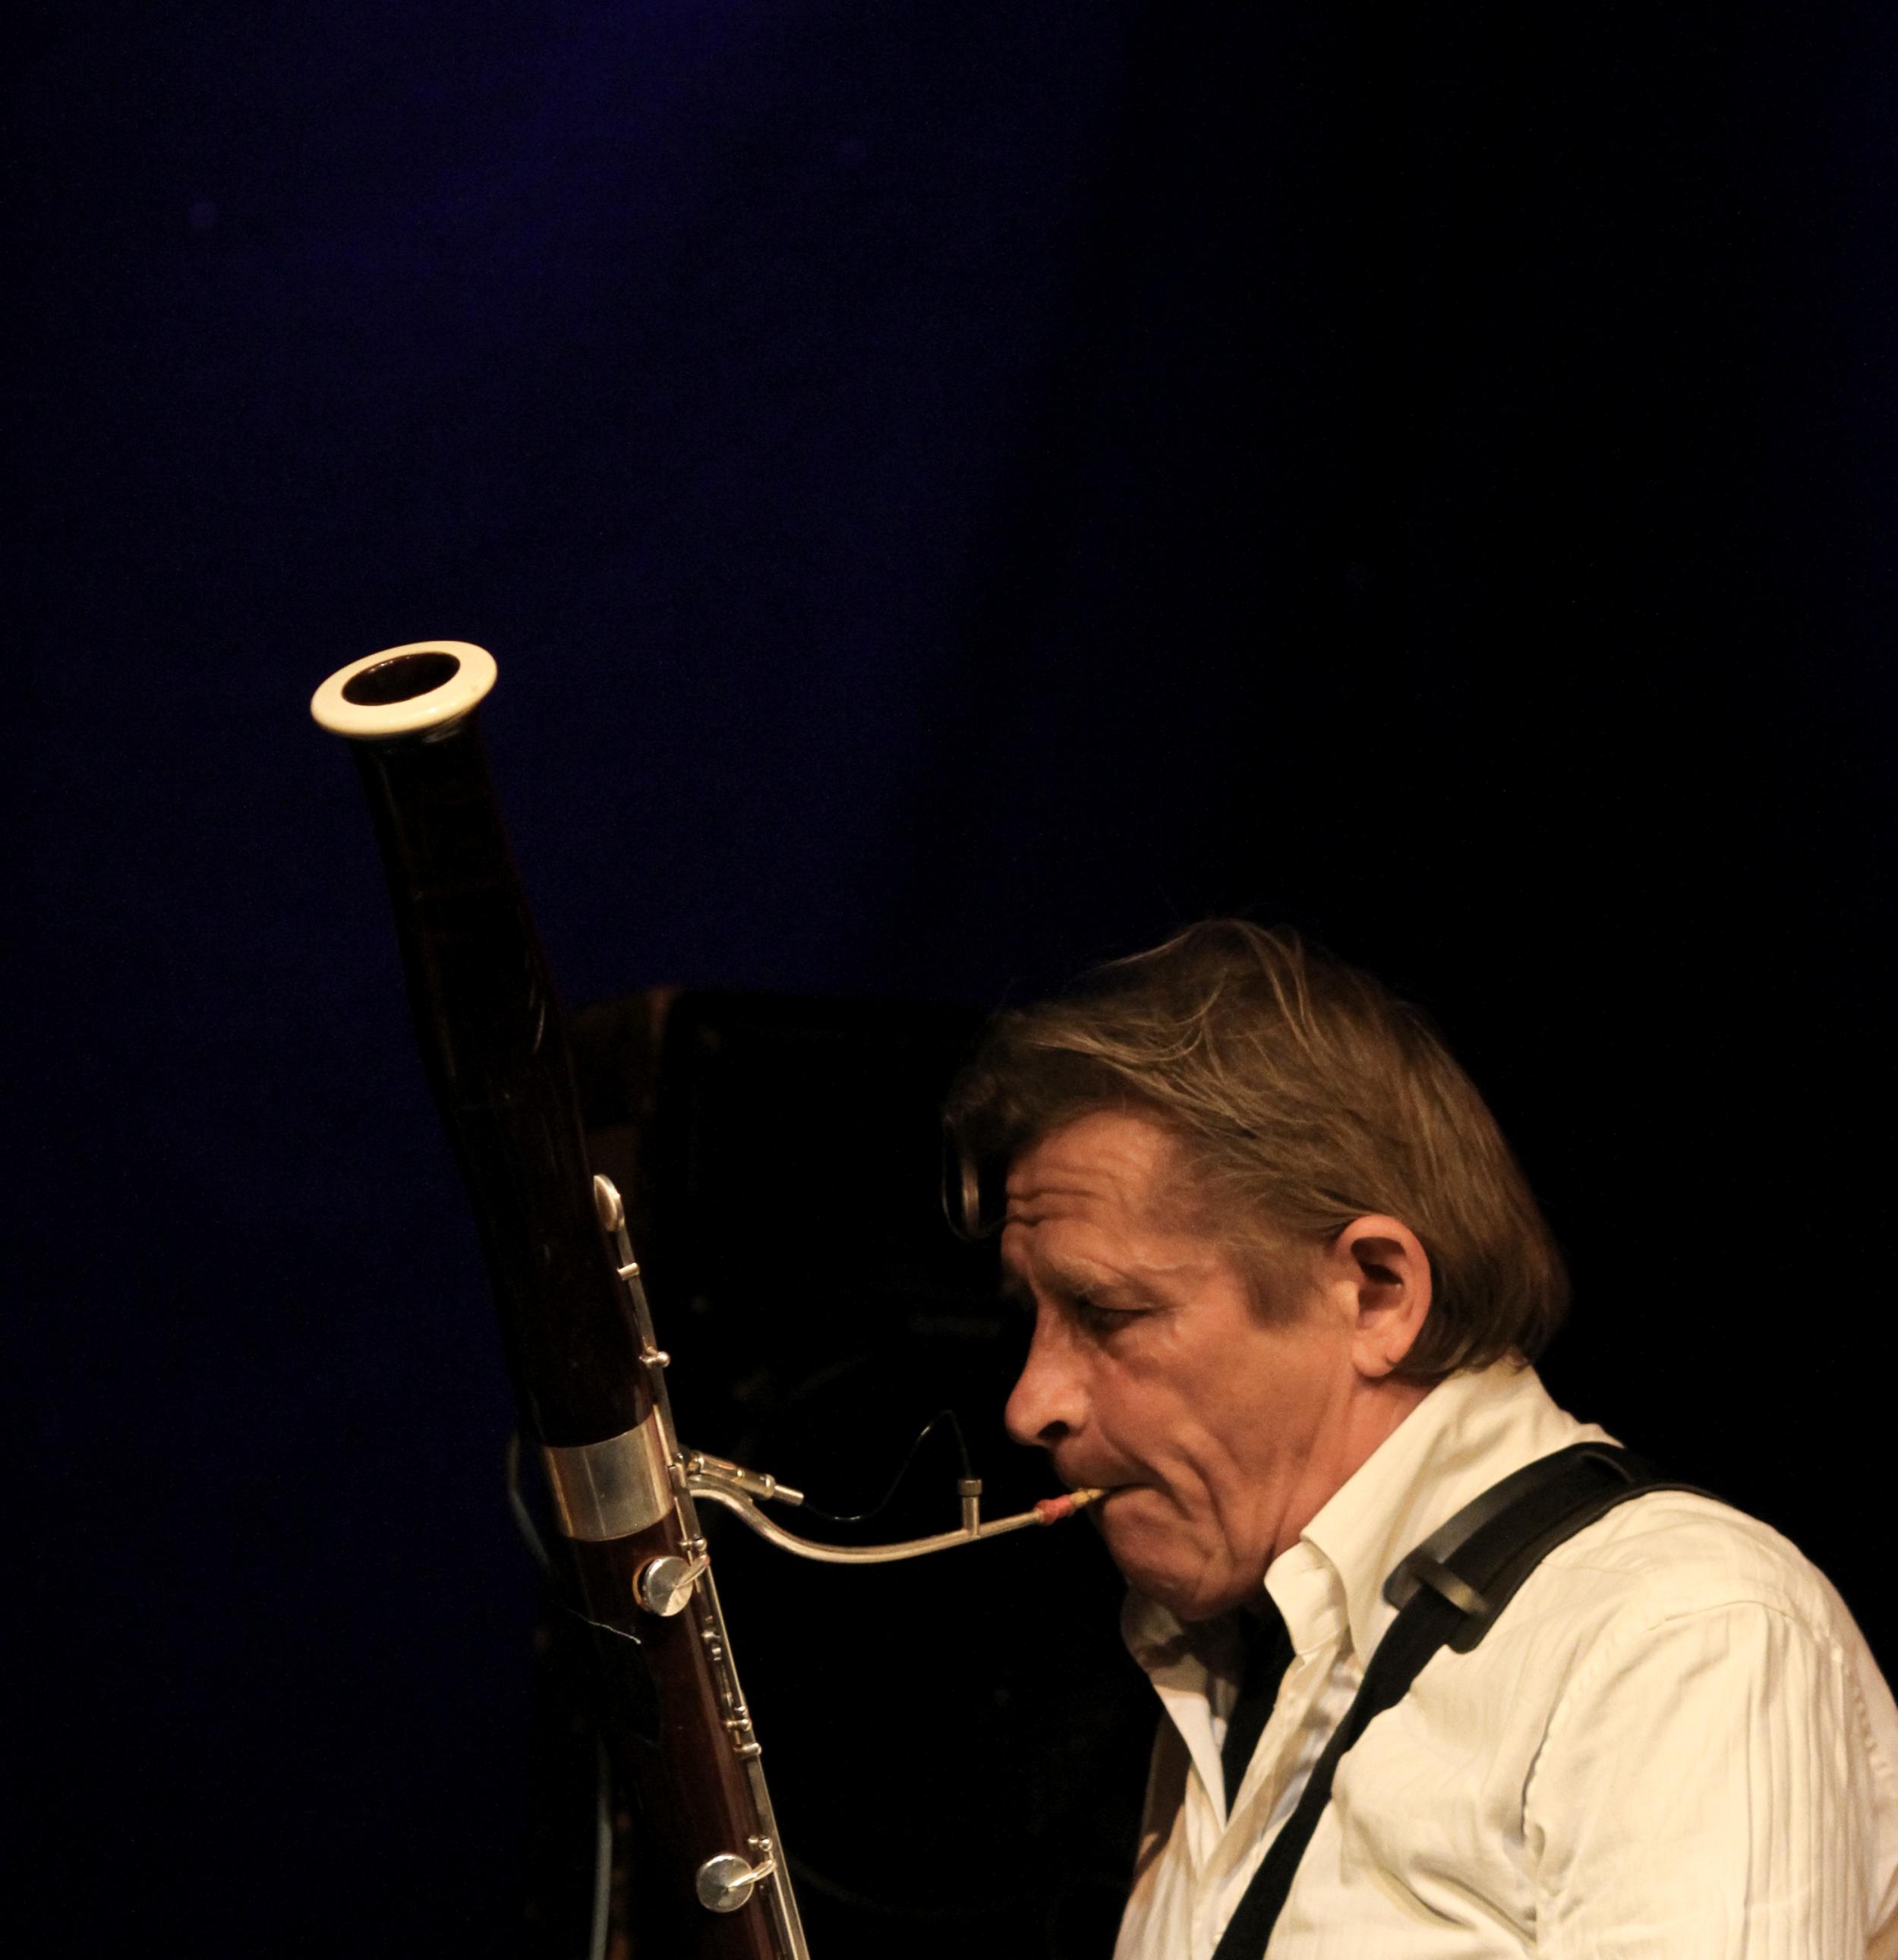 Peter Bastian (Basson) from the Danish Band Bazaar on Valby Summer Jazz 2012, Copenhagen